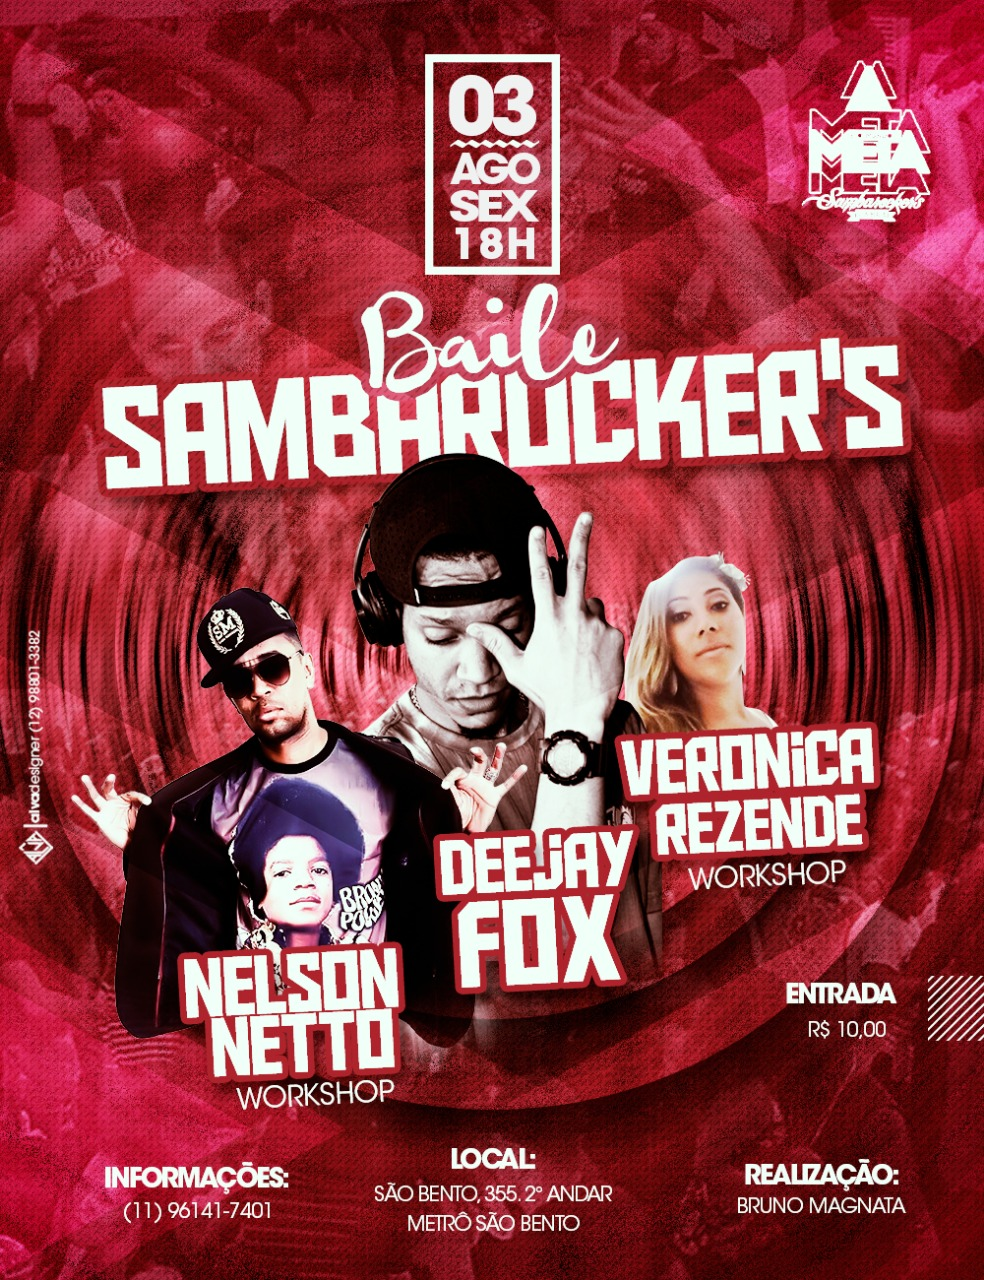 Baile da equipe Sambarockers é nesta sexta ao lado do metrô #nota